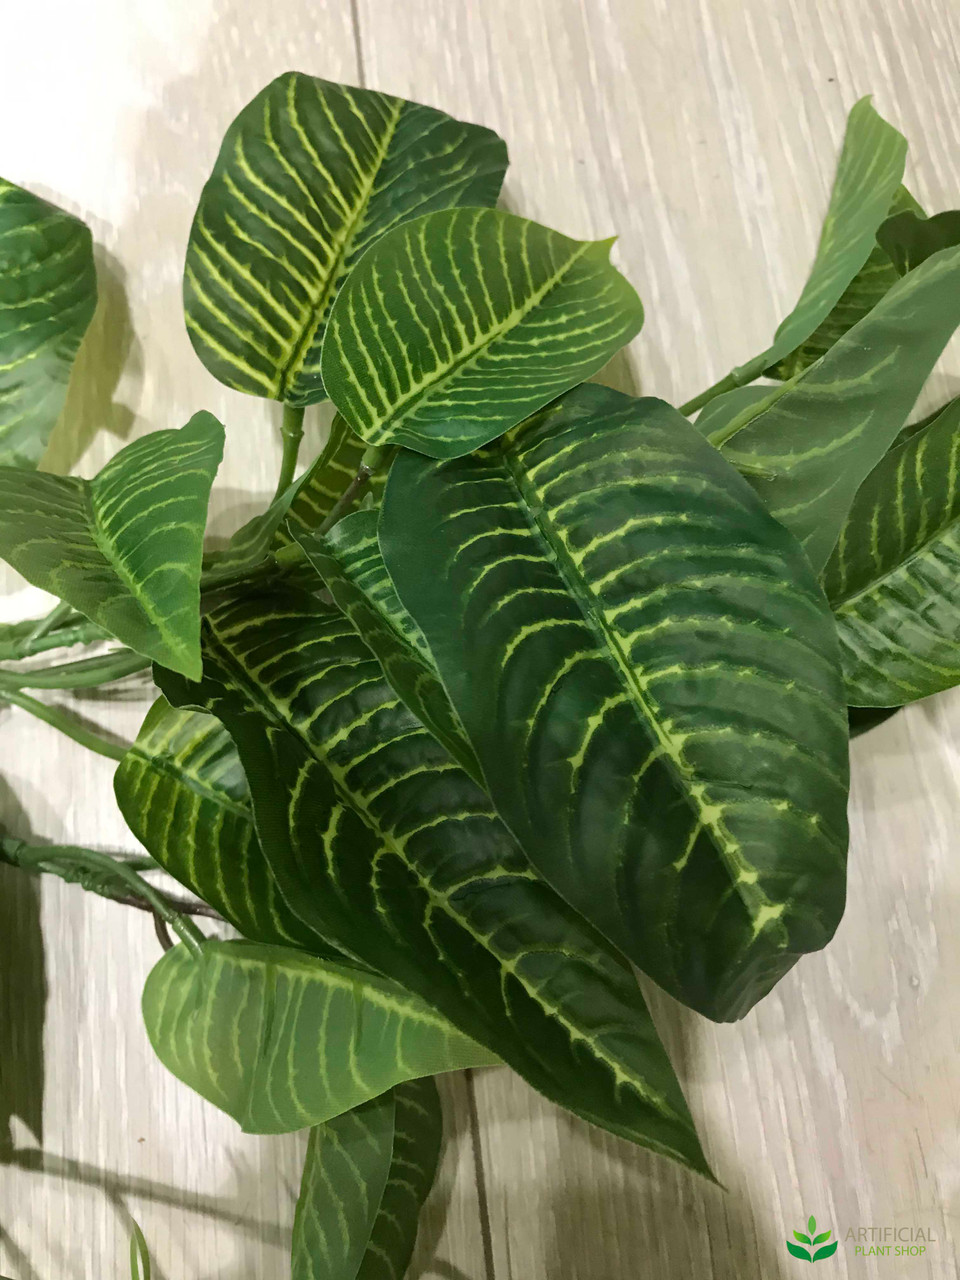 Artificial hanging plant leaf